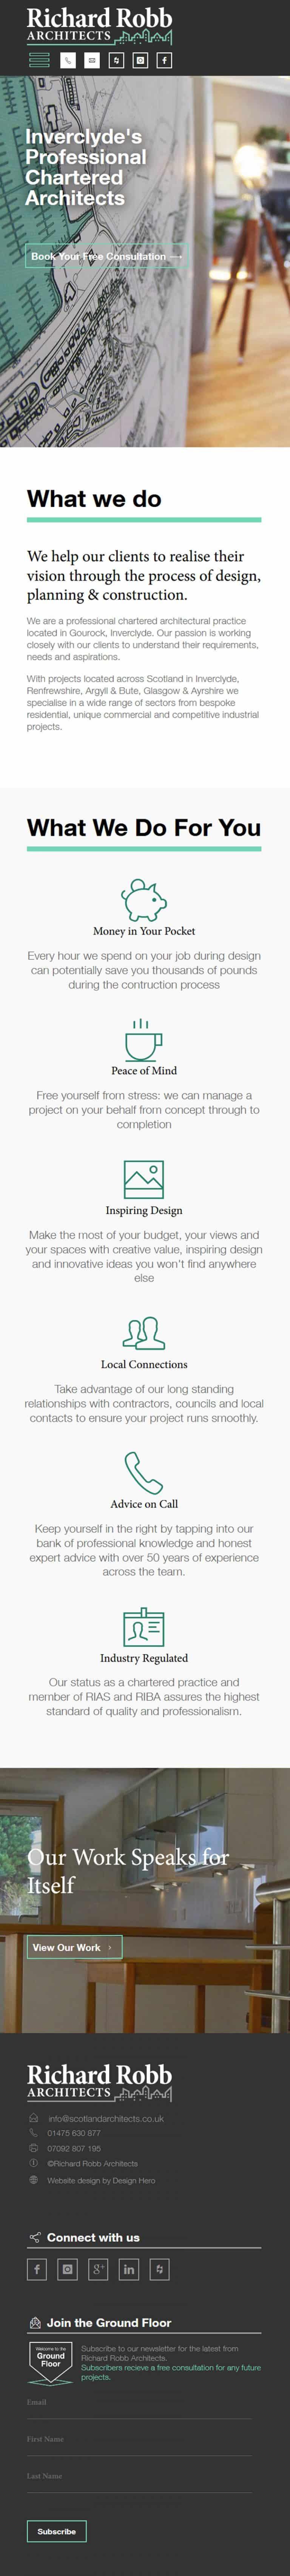 design of mobile portfolio website for Richard Robb Architects